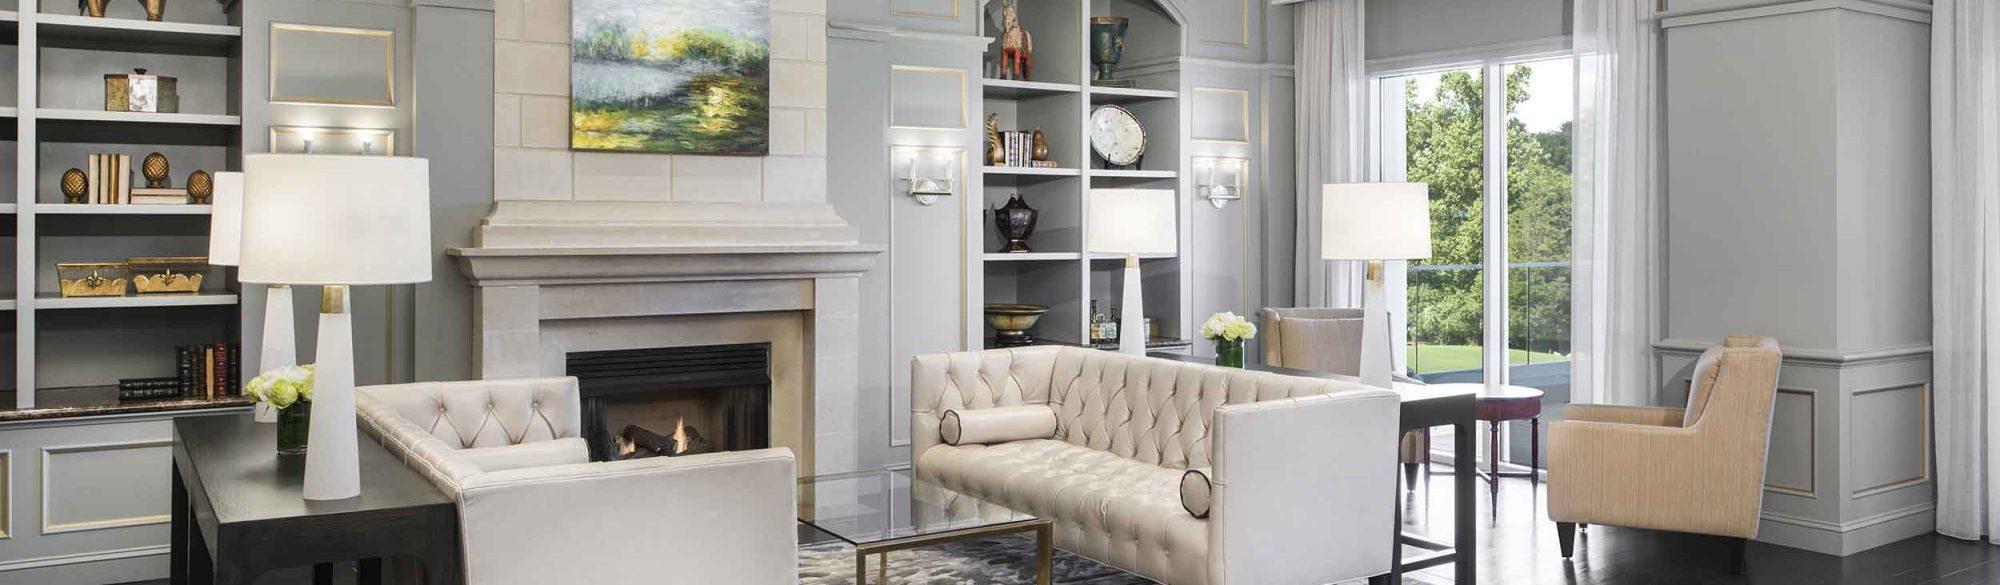 The Ballantyne Charlotte Lobby Fireplace